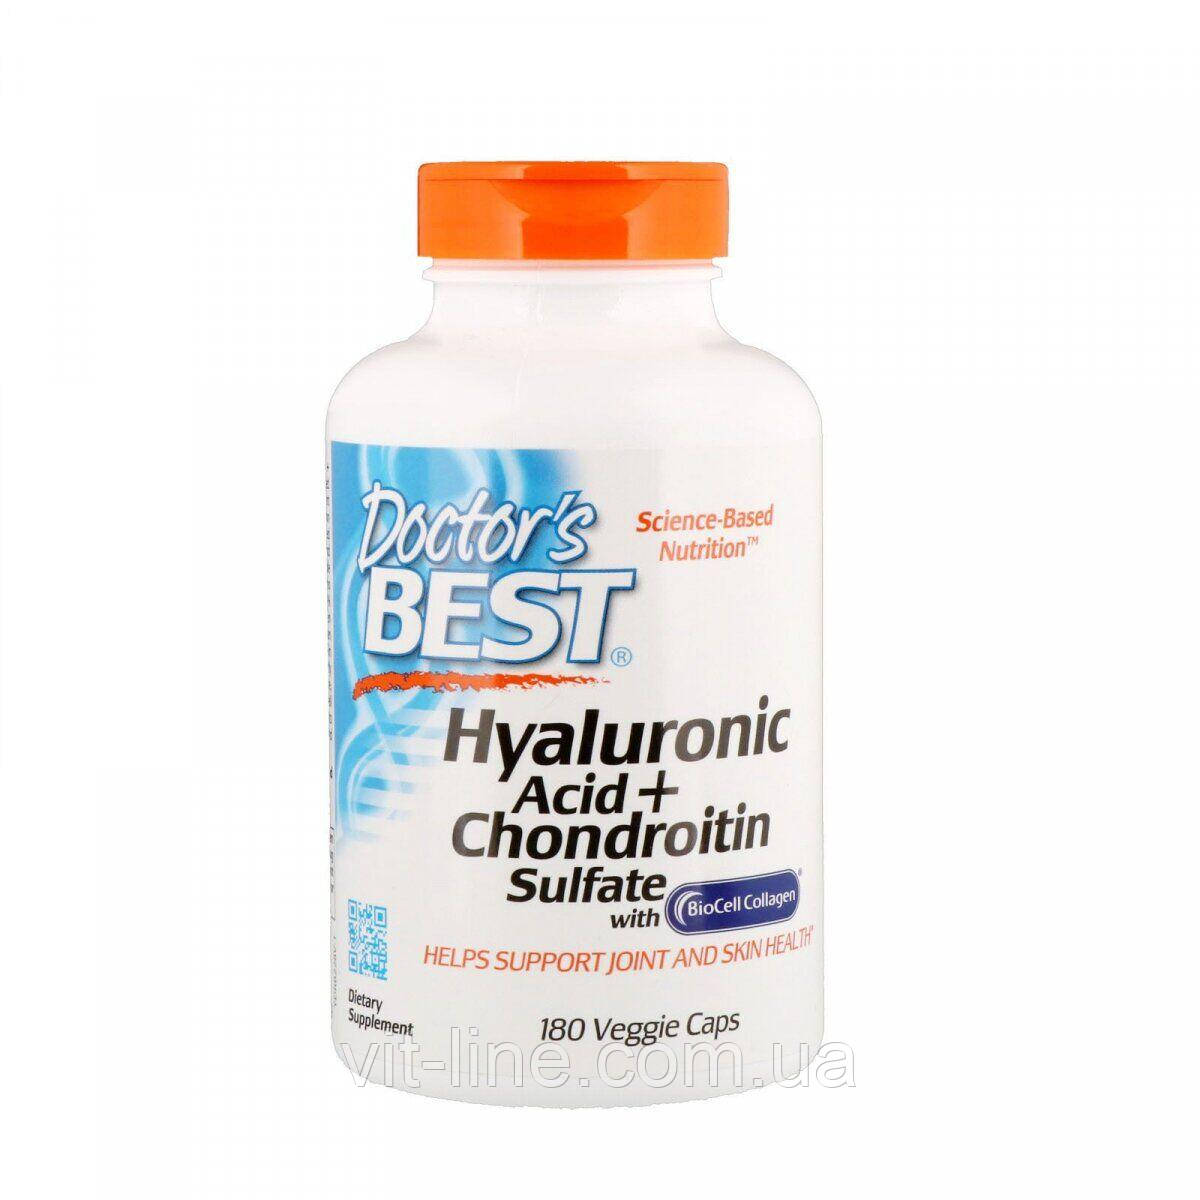 Гиалуроновая кислота с сульфотом хондроитина от Doctor's Best (180 капсул)